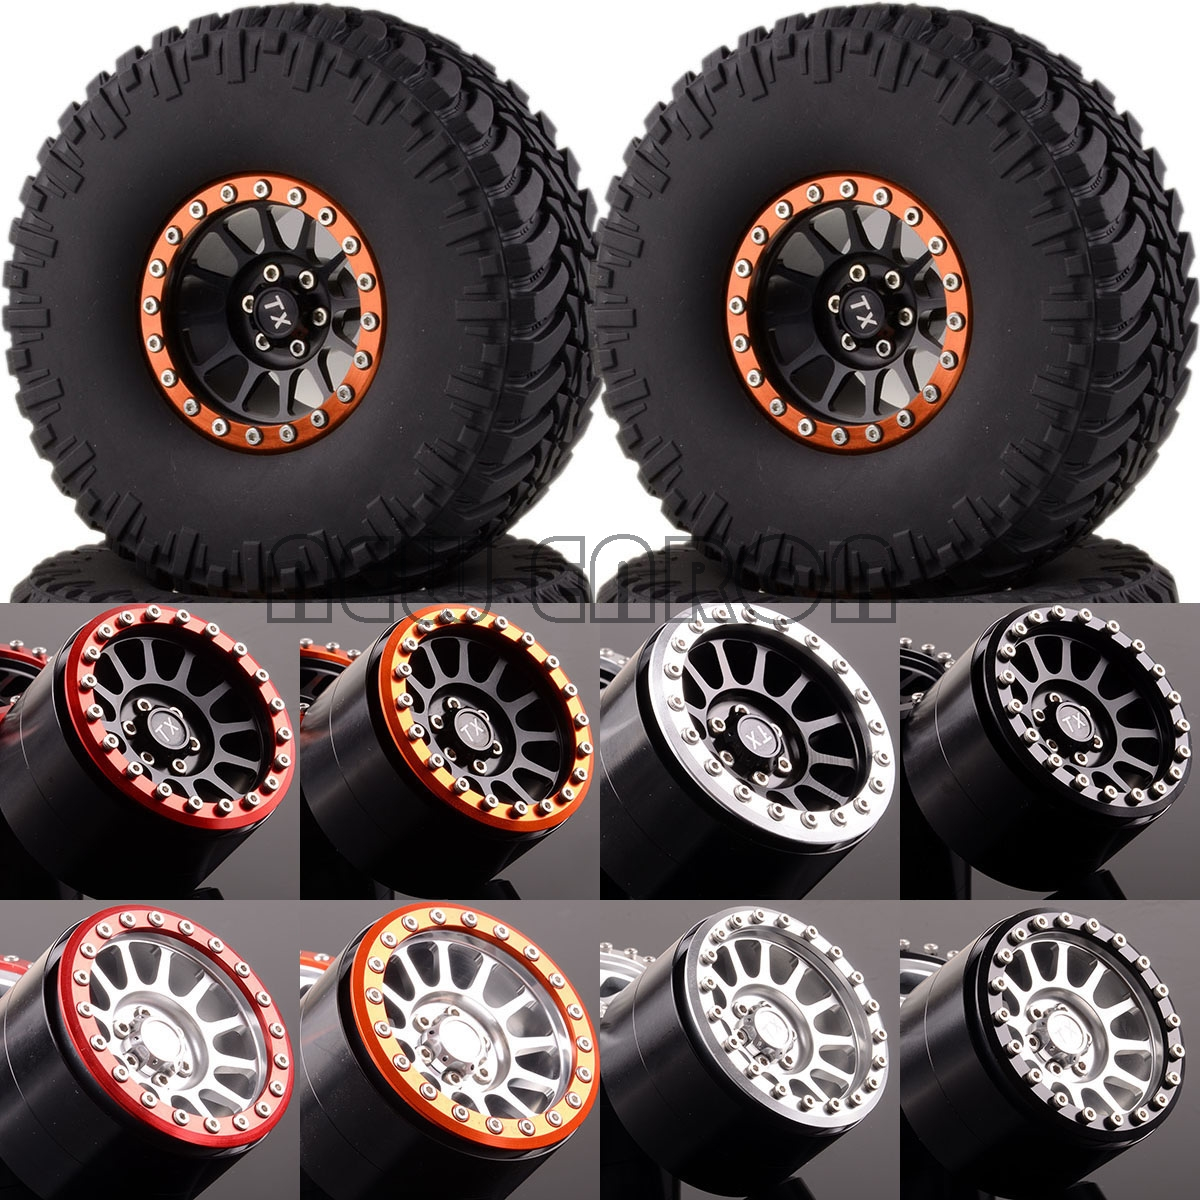 NEW ENRON 1:10 Aluminum 2.2 Beadlock Wheels & Super Swamper TIRES 2022-3033 FOR 1/10 Crawler mxfans rc 1 10 2 2 crawler car inflatable tires black alloy beadlock pack of 4